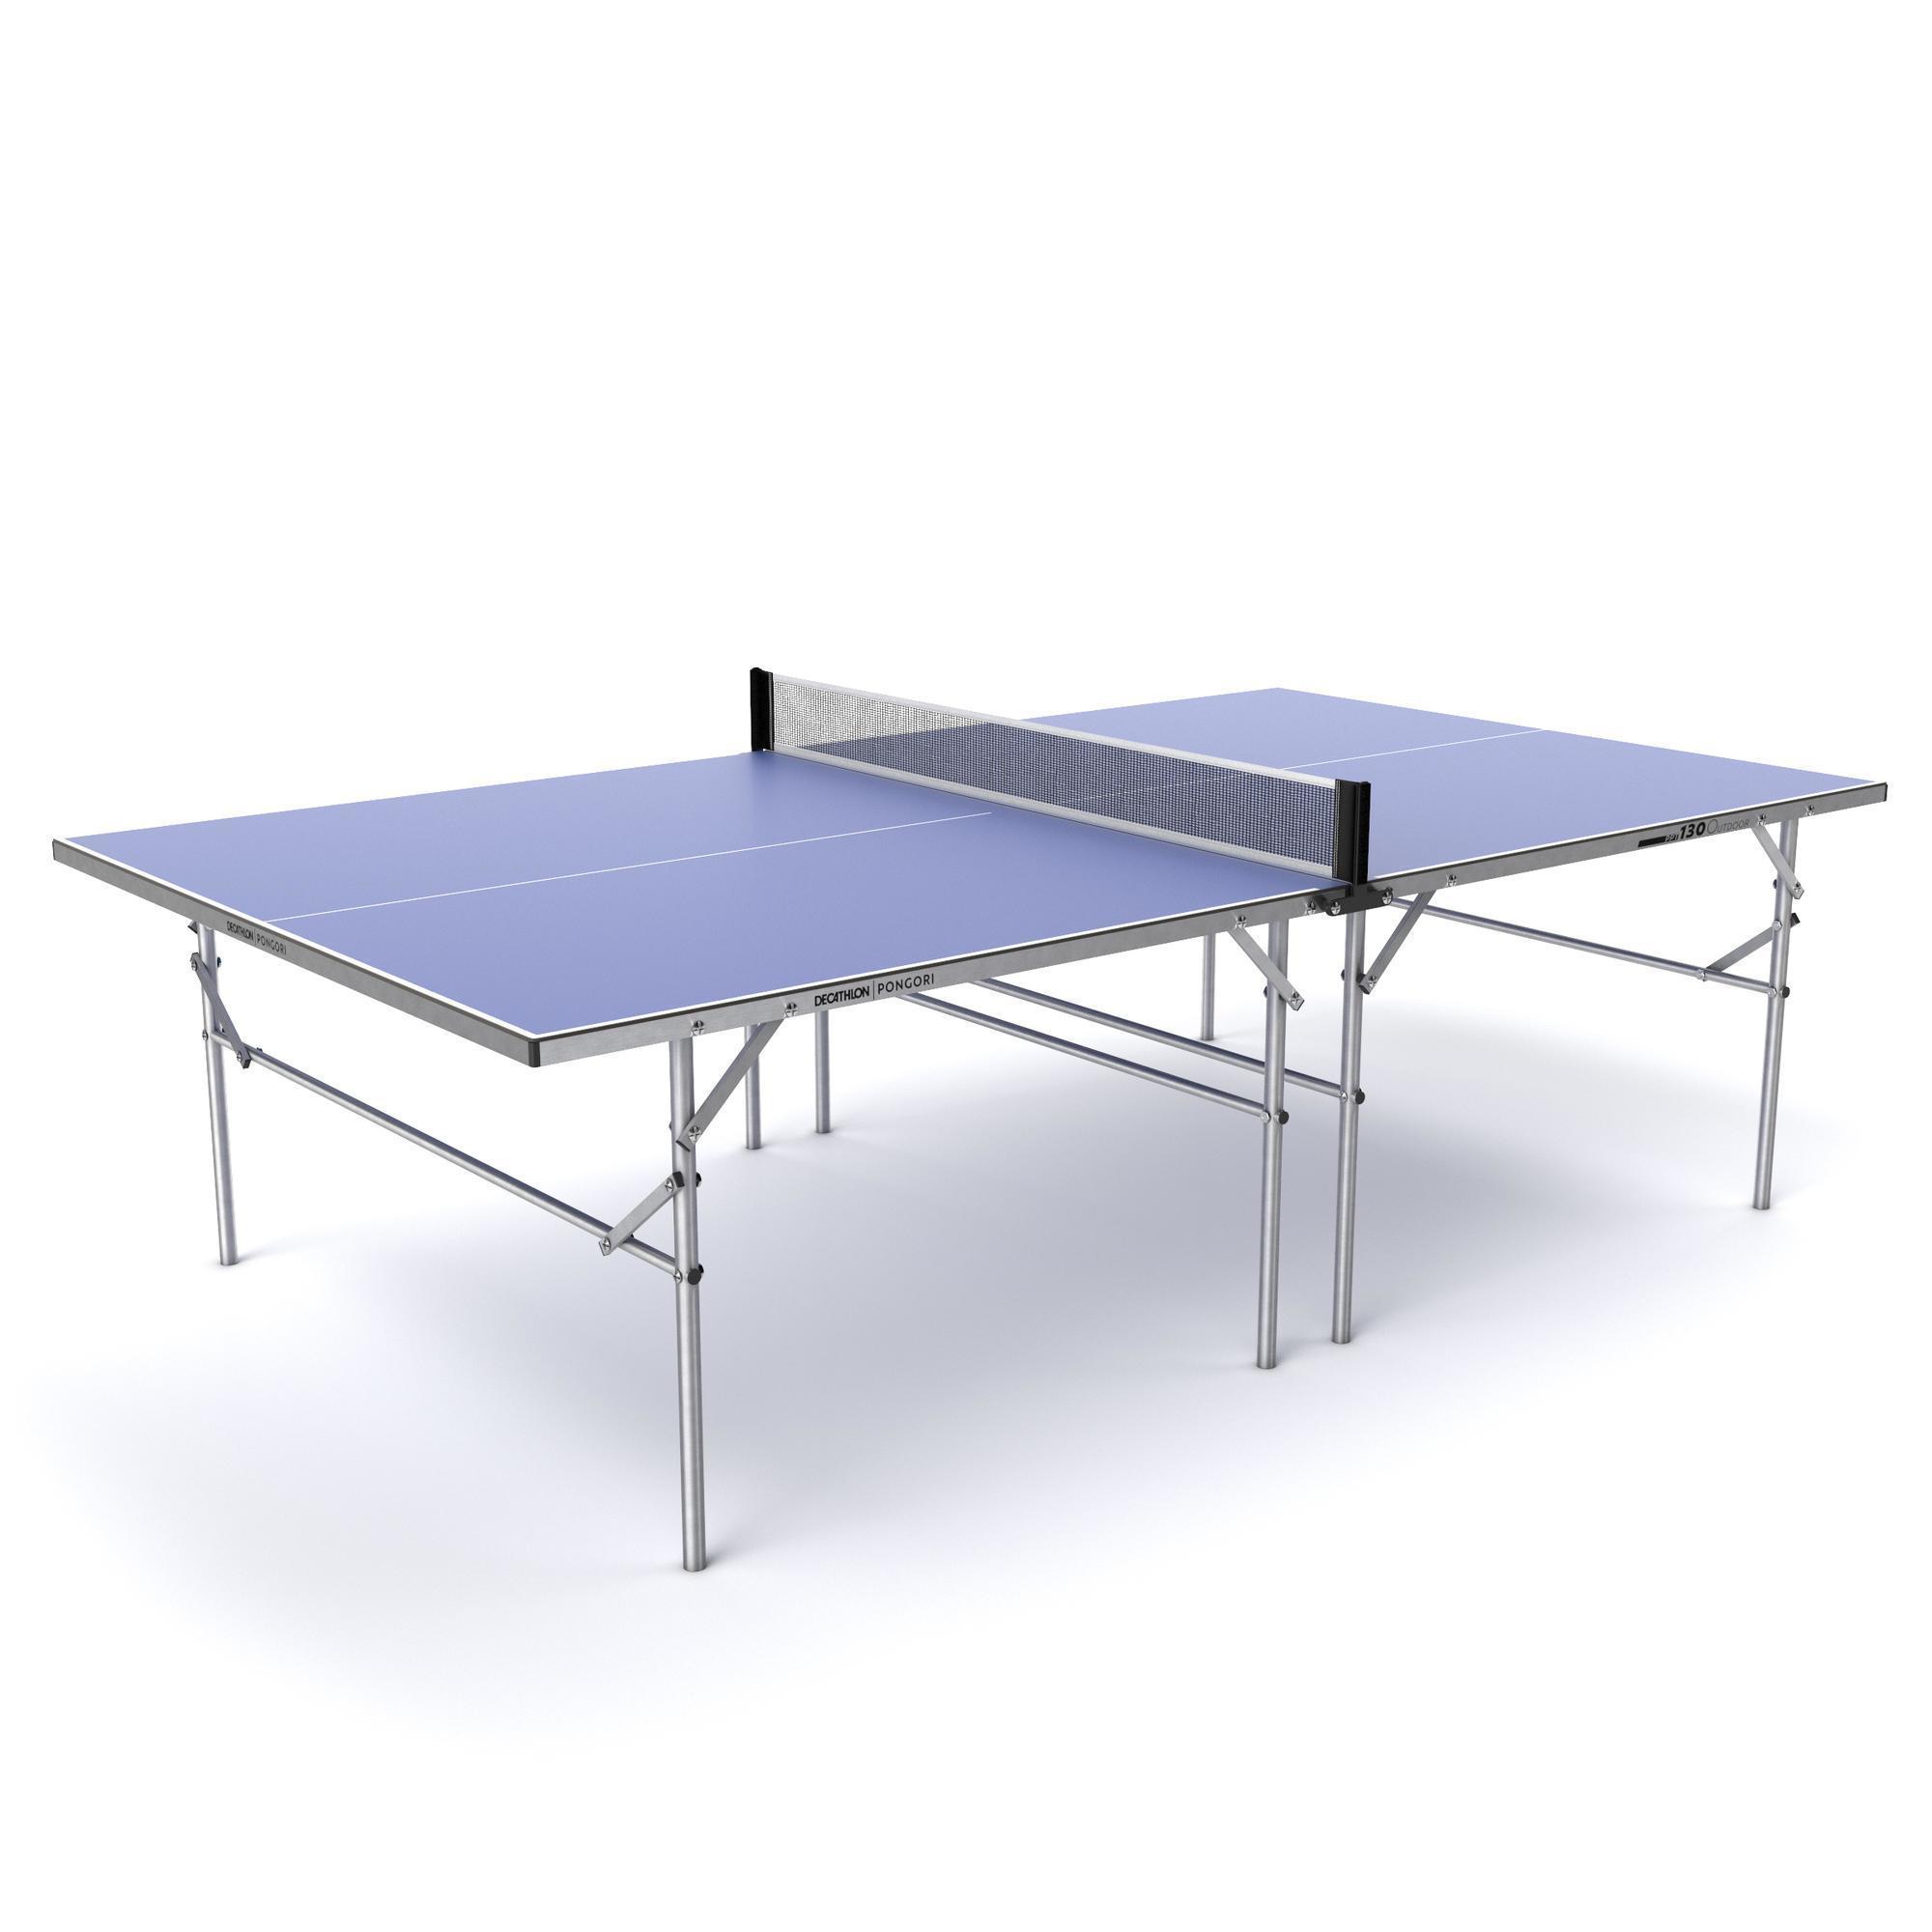 Super Tables Decathlon Download Free Architecture Designs Embacsunscenecom